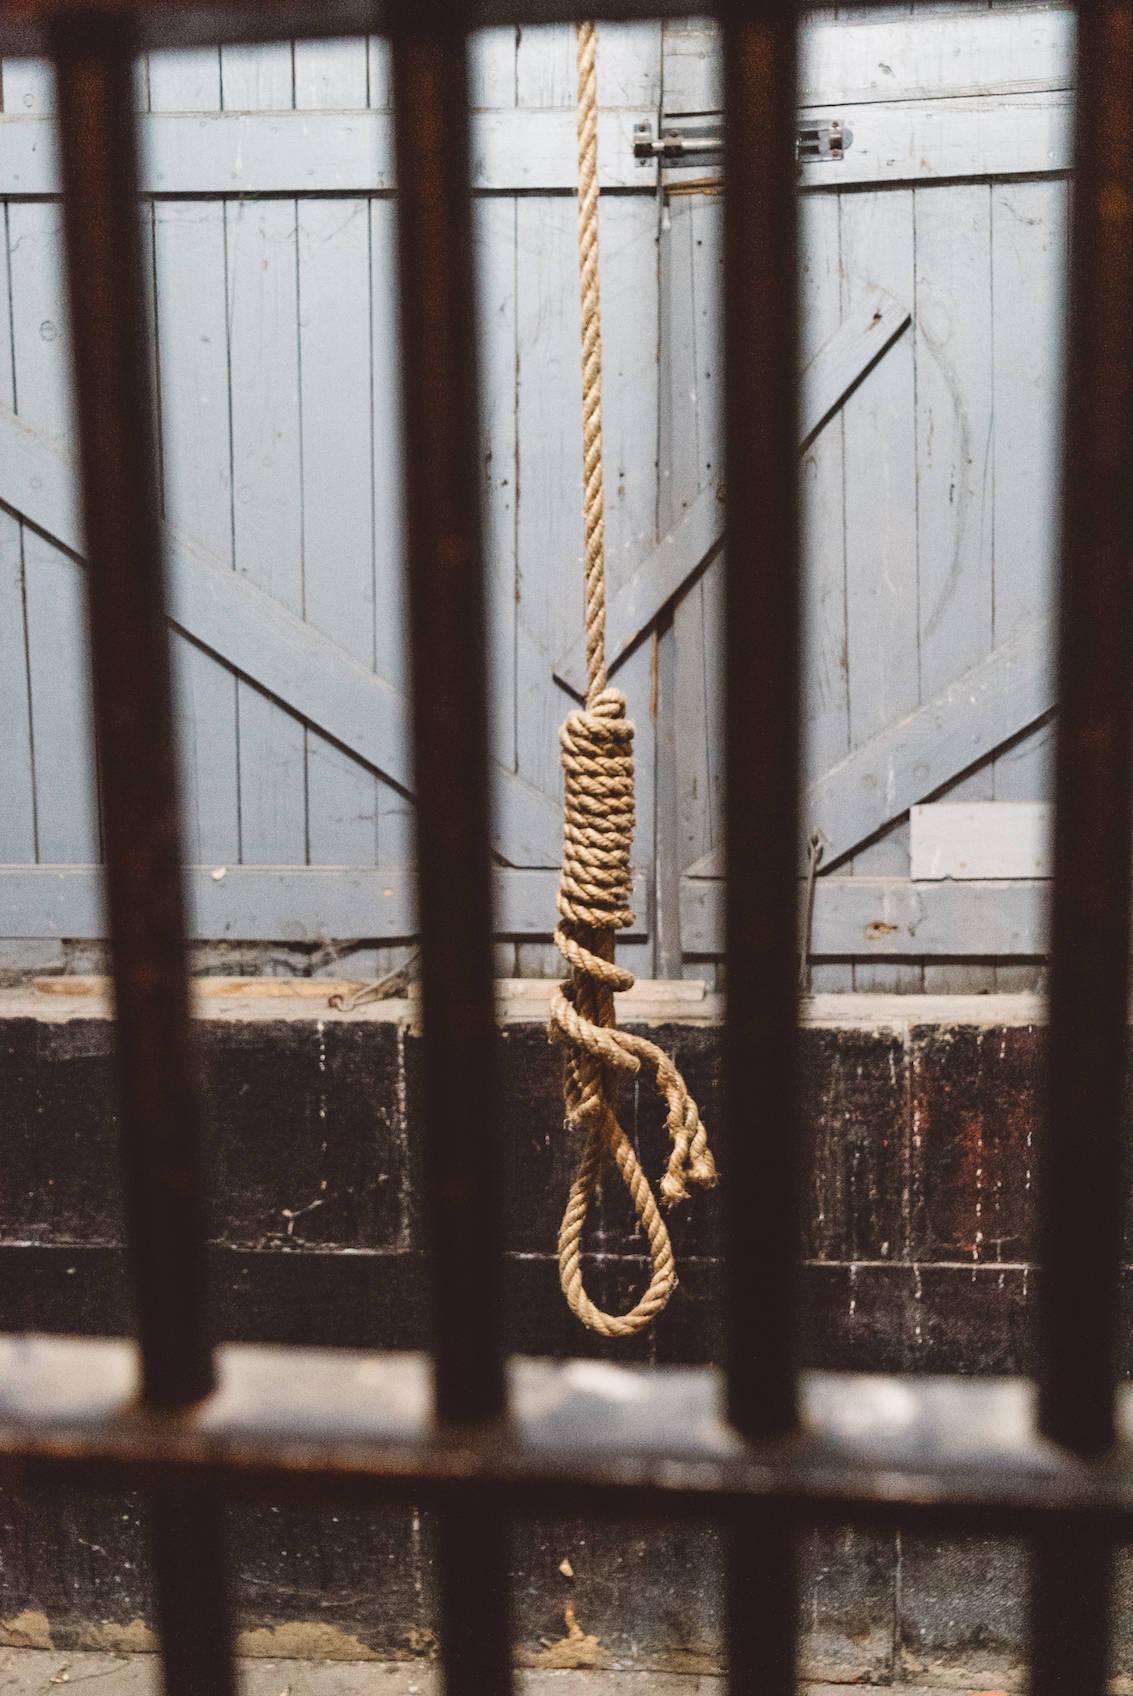 carlton county jail ottawa_7